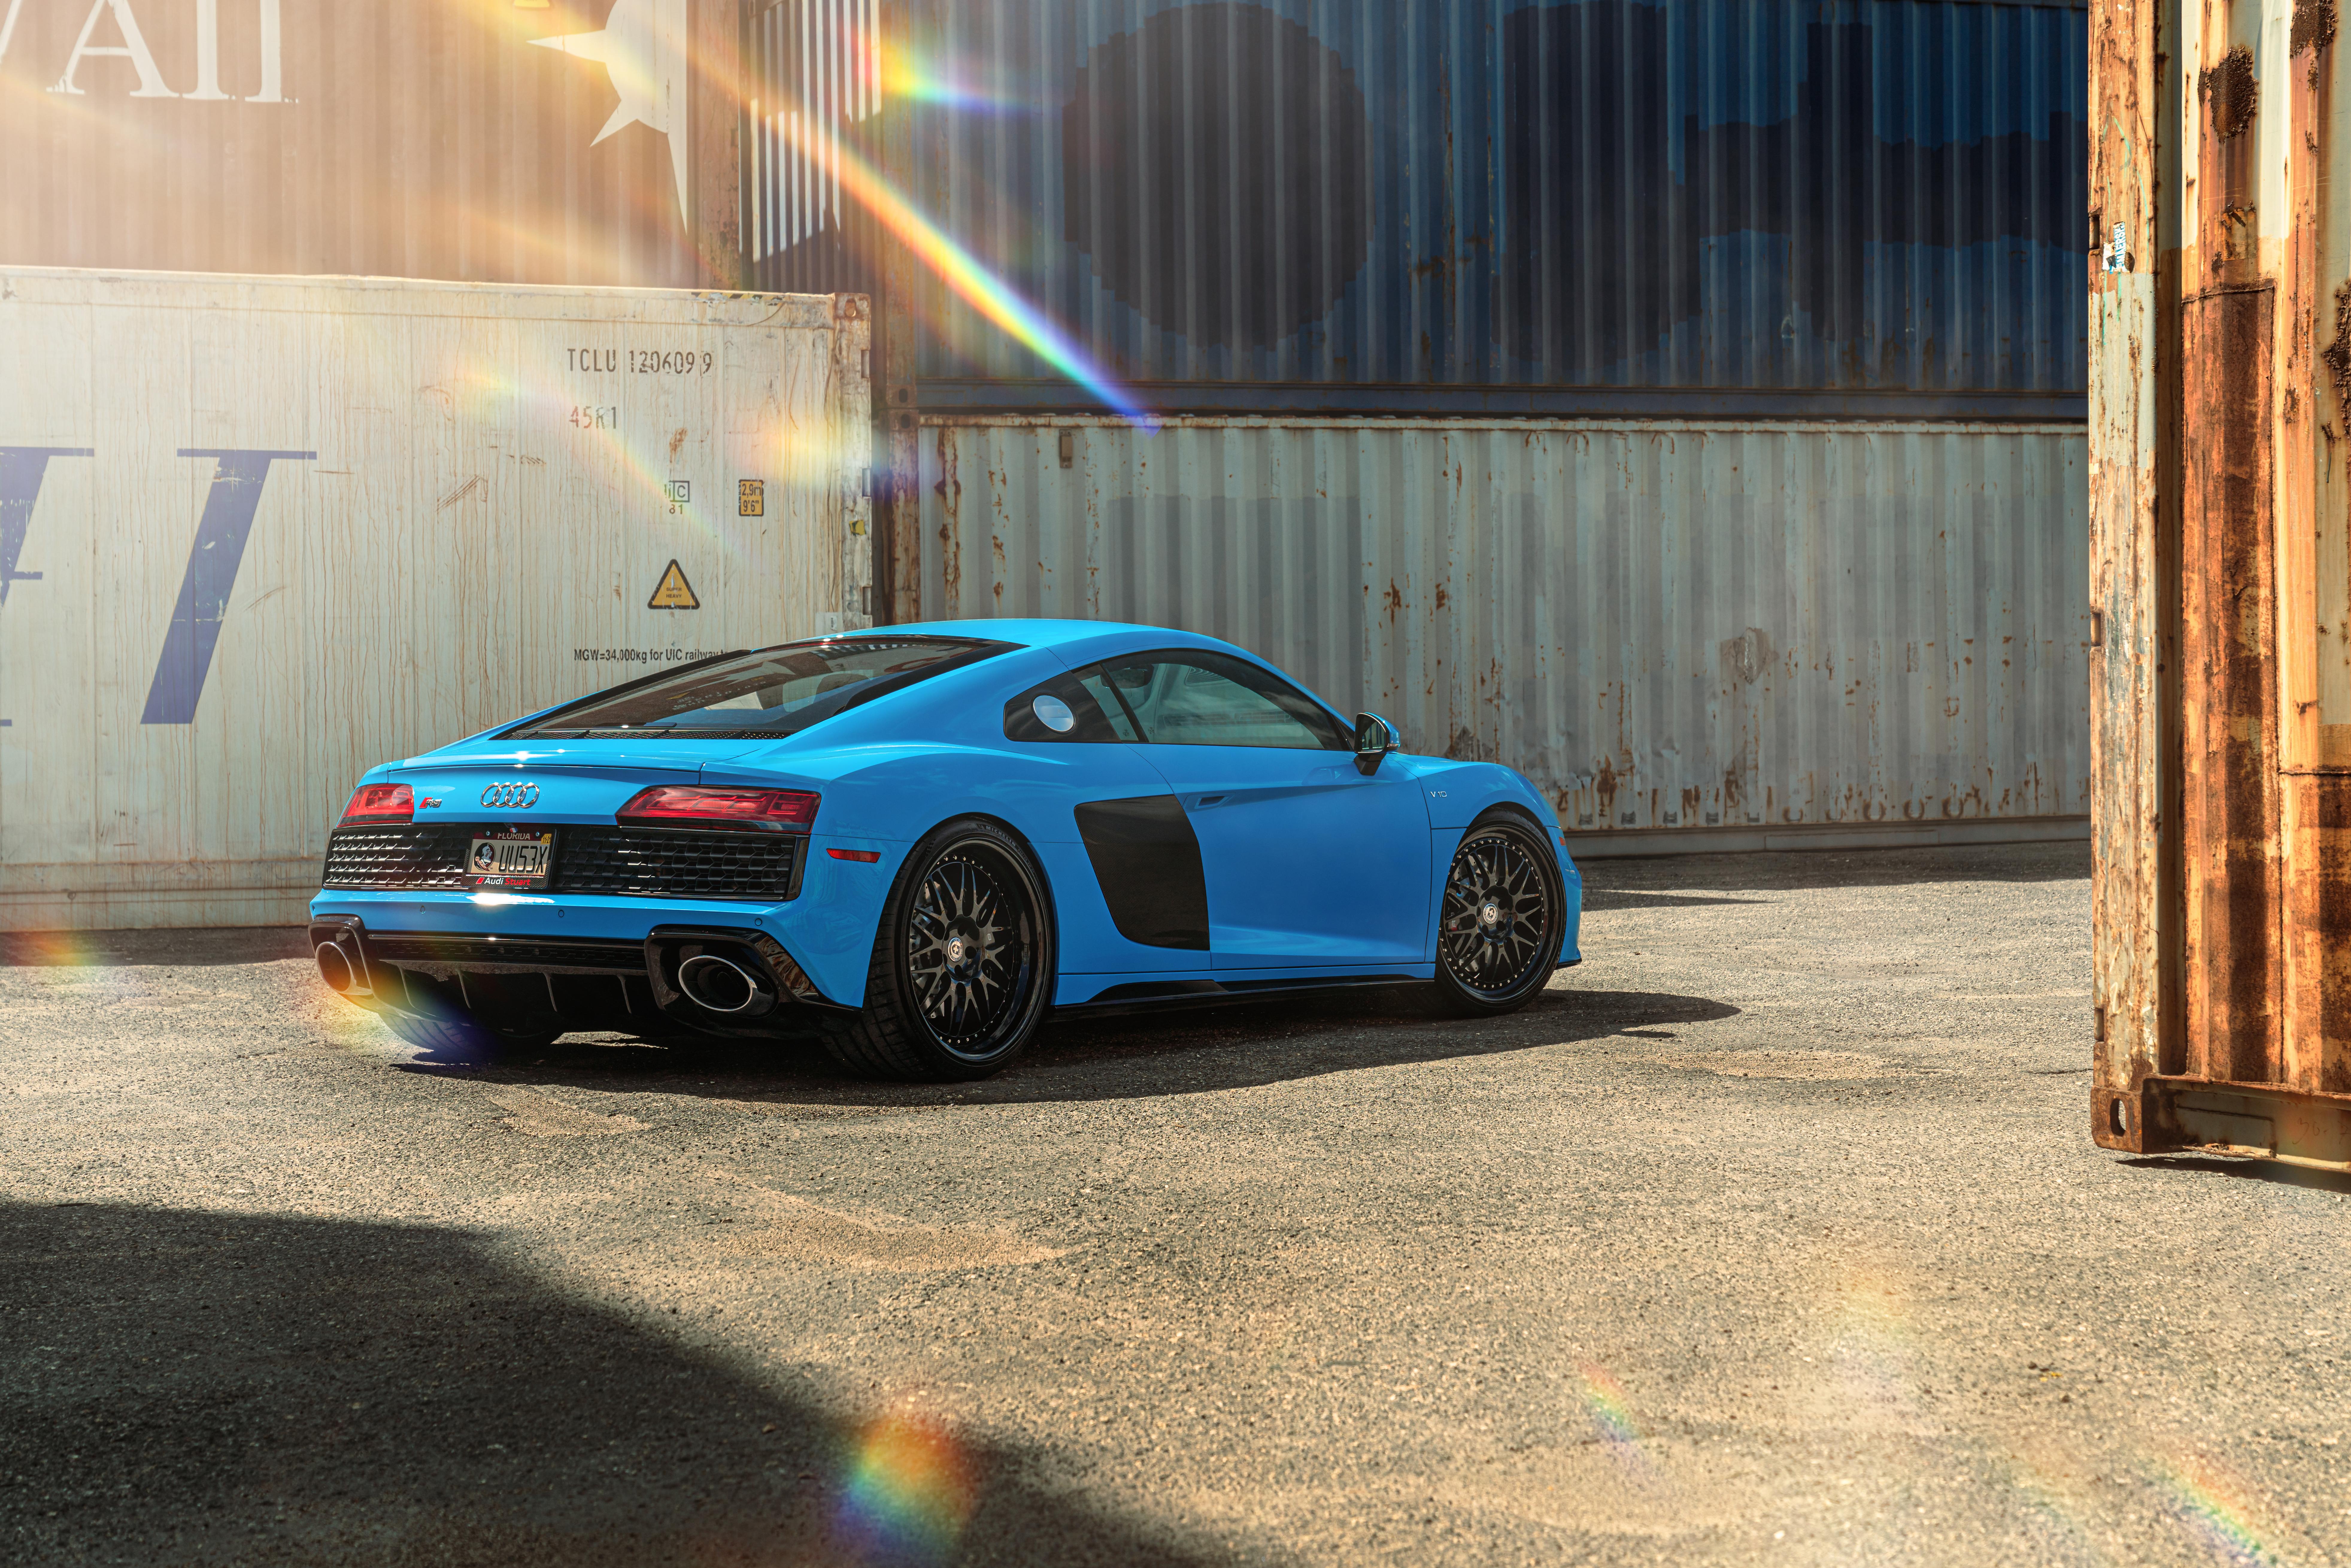 blue audi r8 4k 1618922966 - Blue Audi R8 4k - Blue Audi R8 4k wallpapers